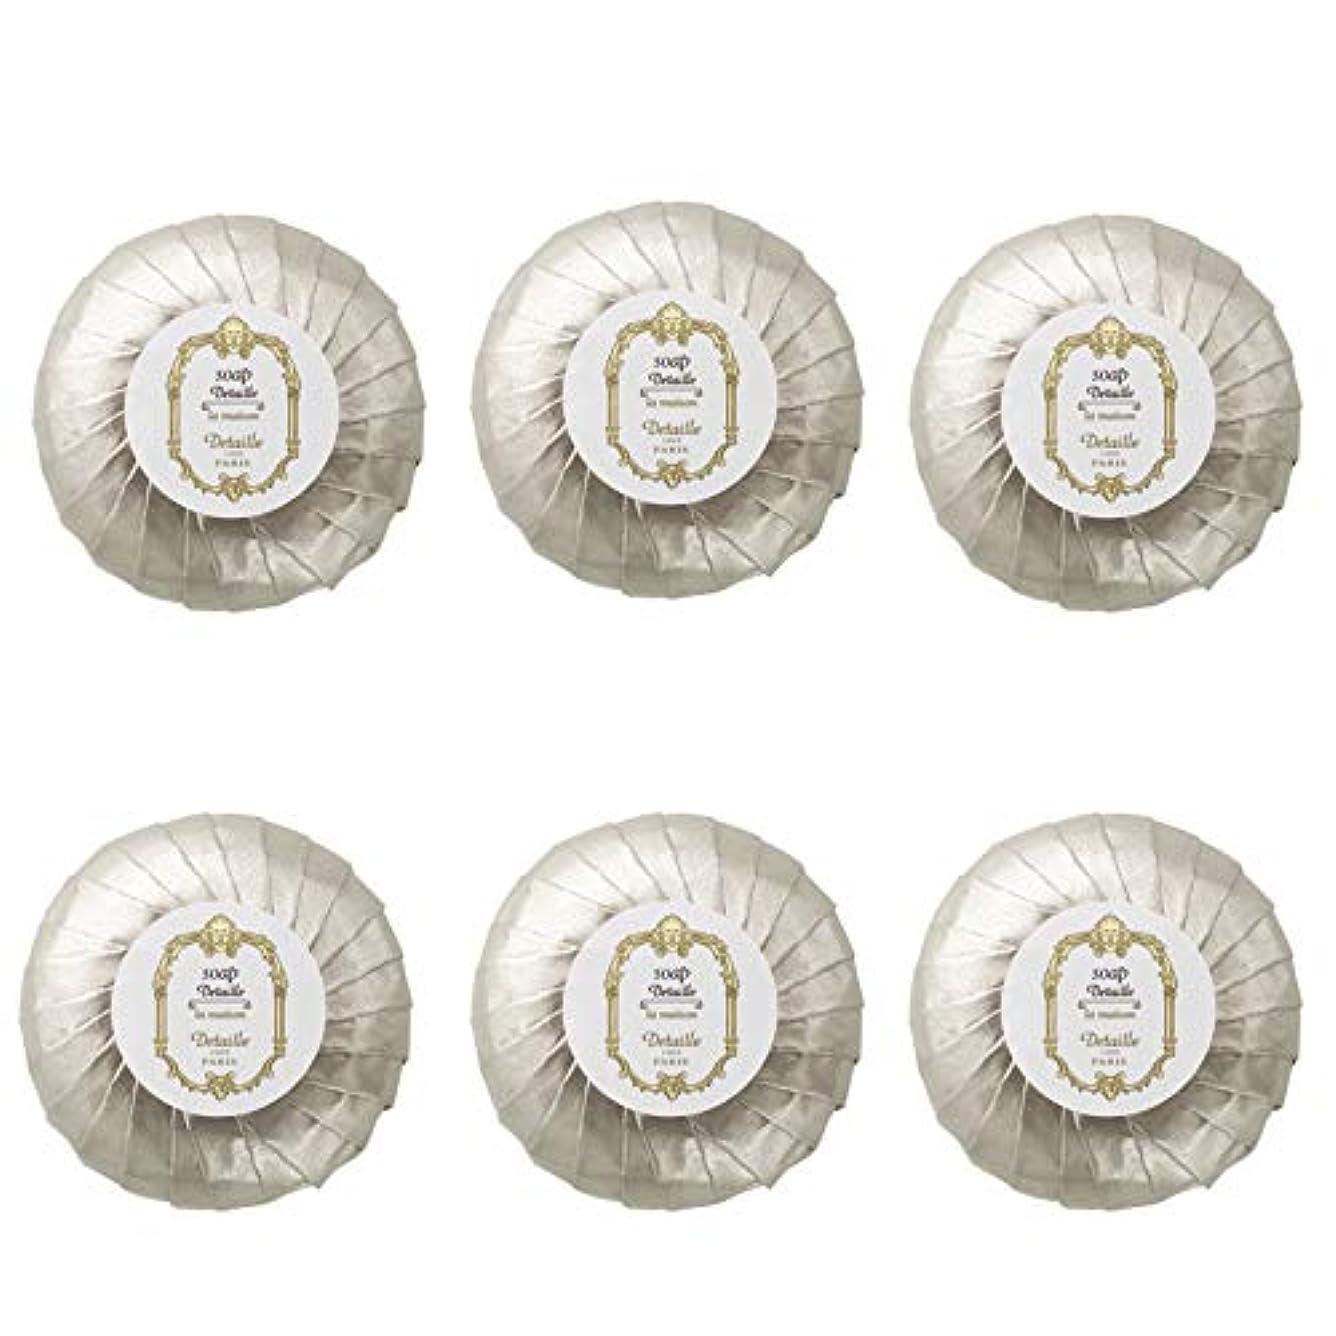 POLA デタイユ ラ メゾン スキンソープ 固形石鹸 (プリーツ包装) 50g×6個